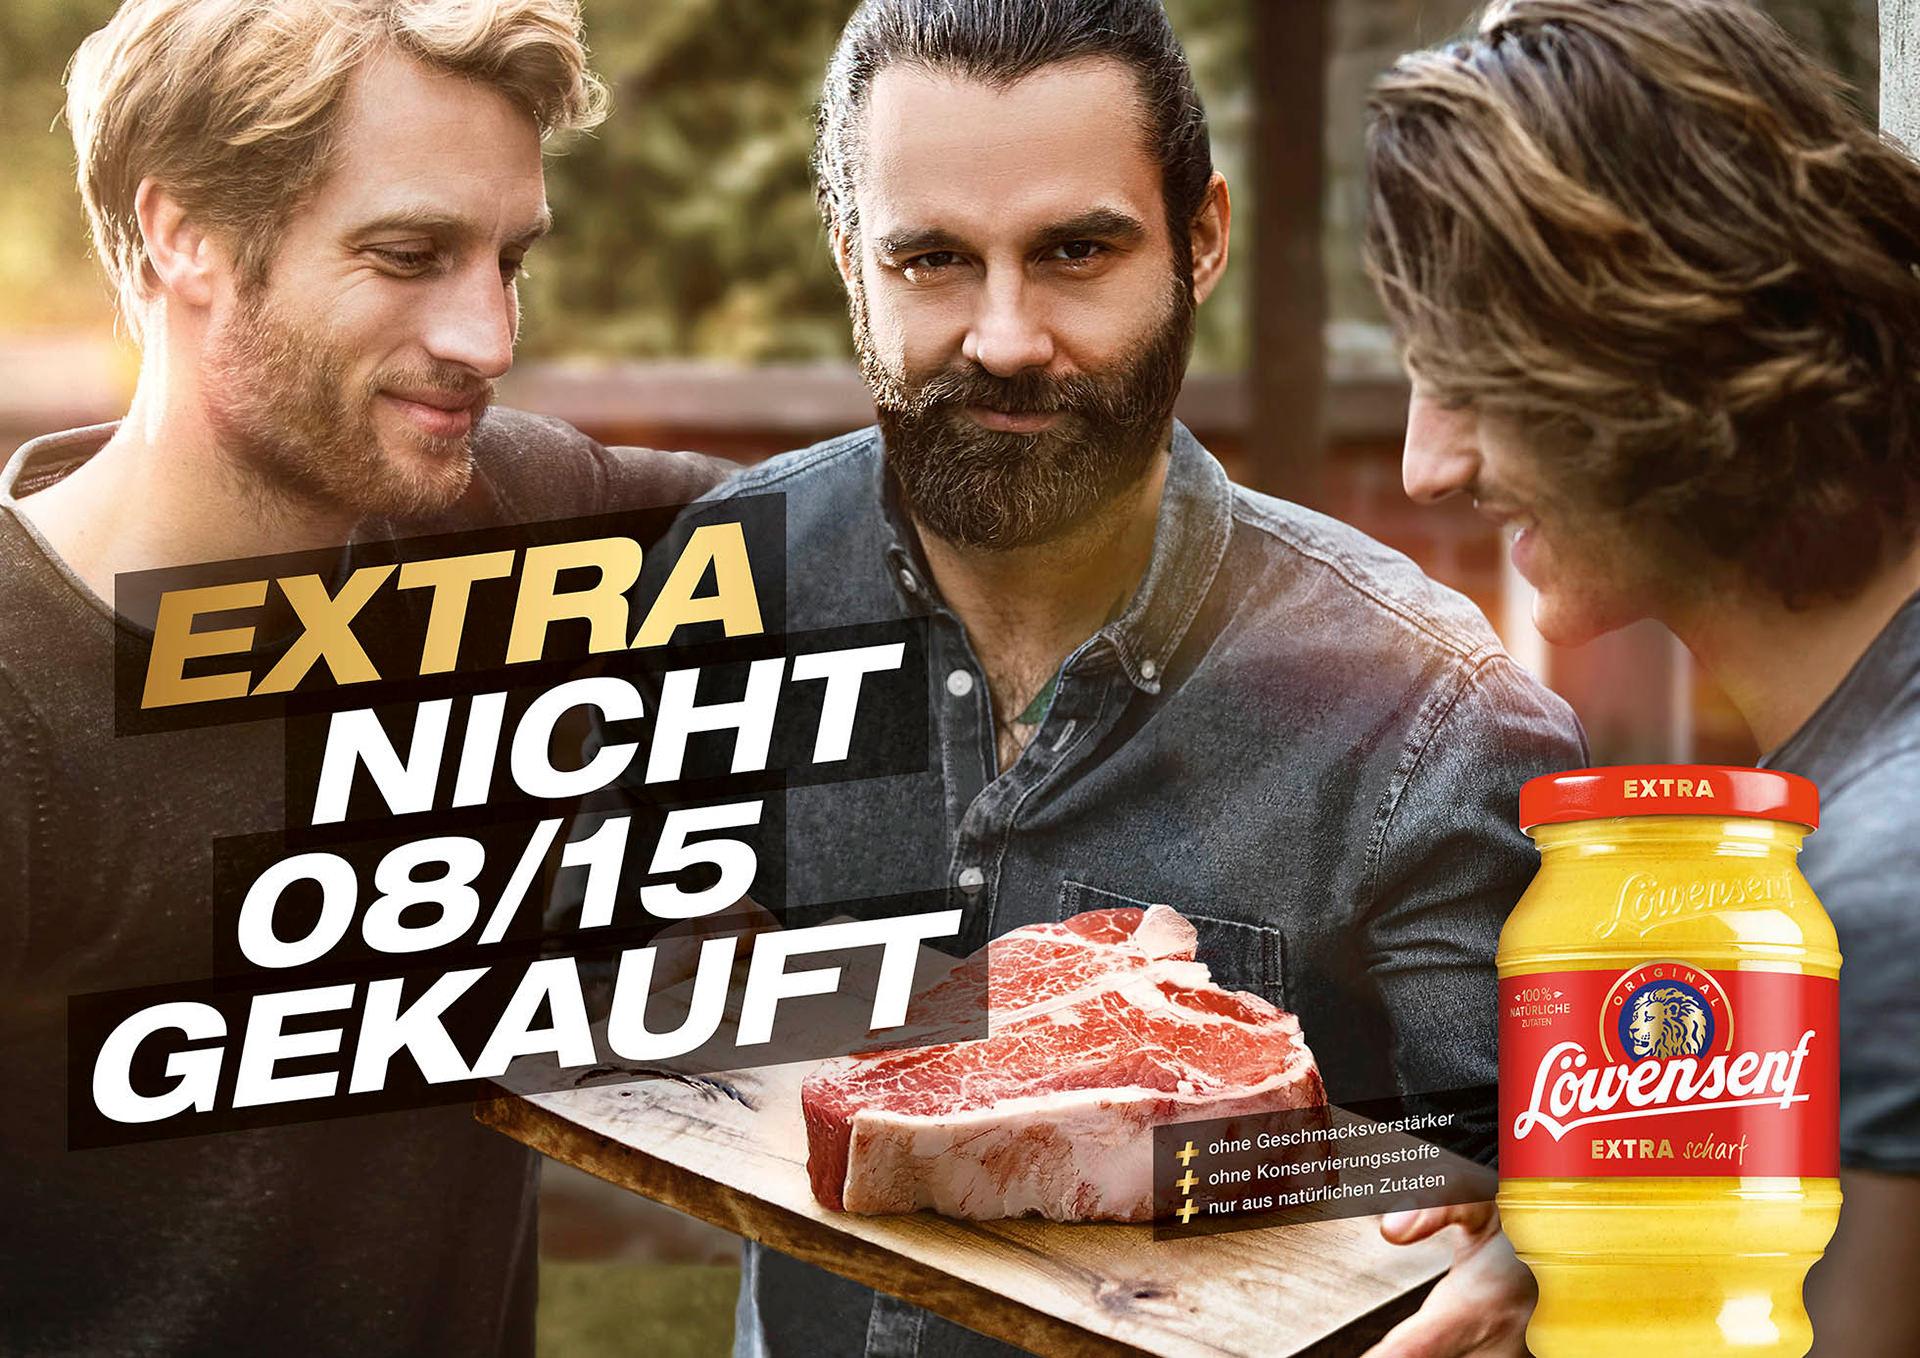 maenner-senf-steak-saftig-loewensenf-kampagne